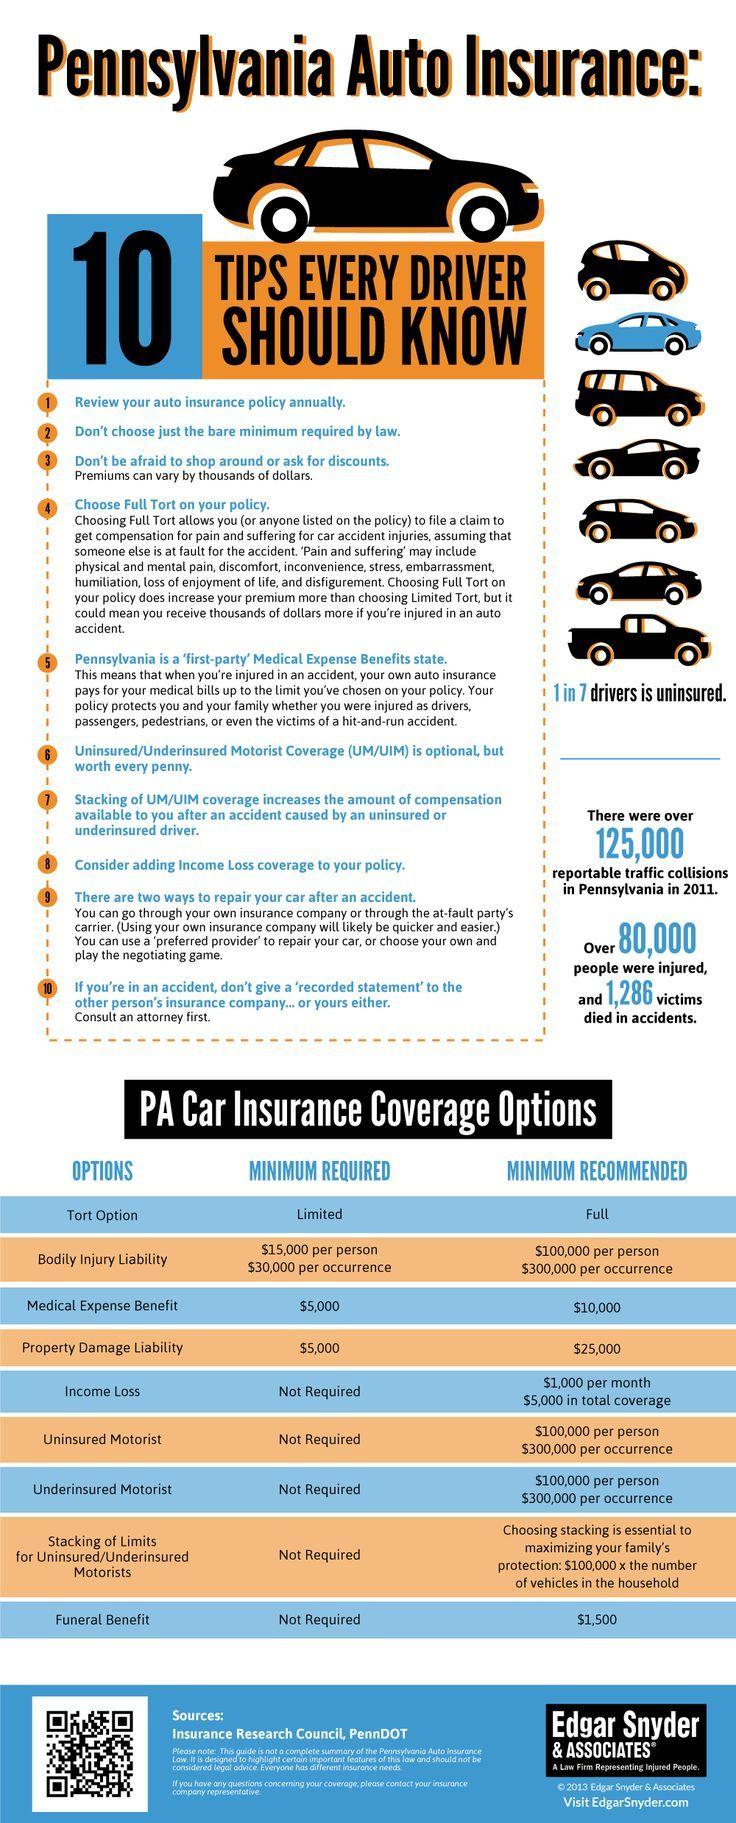 aircraft renters insurance companies